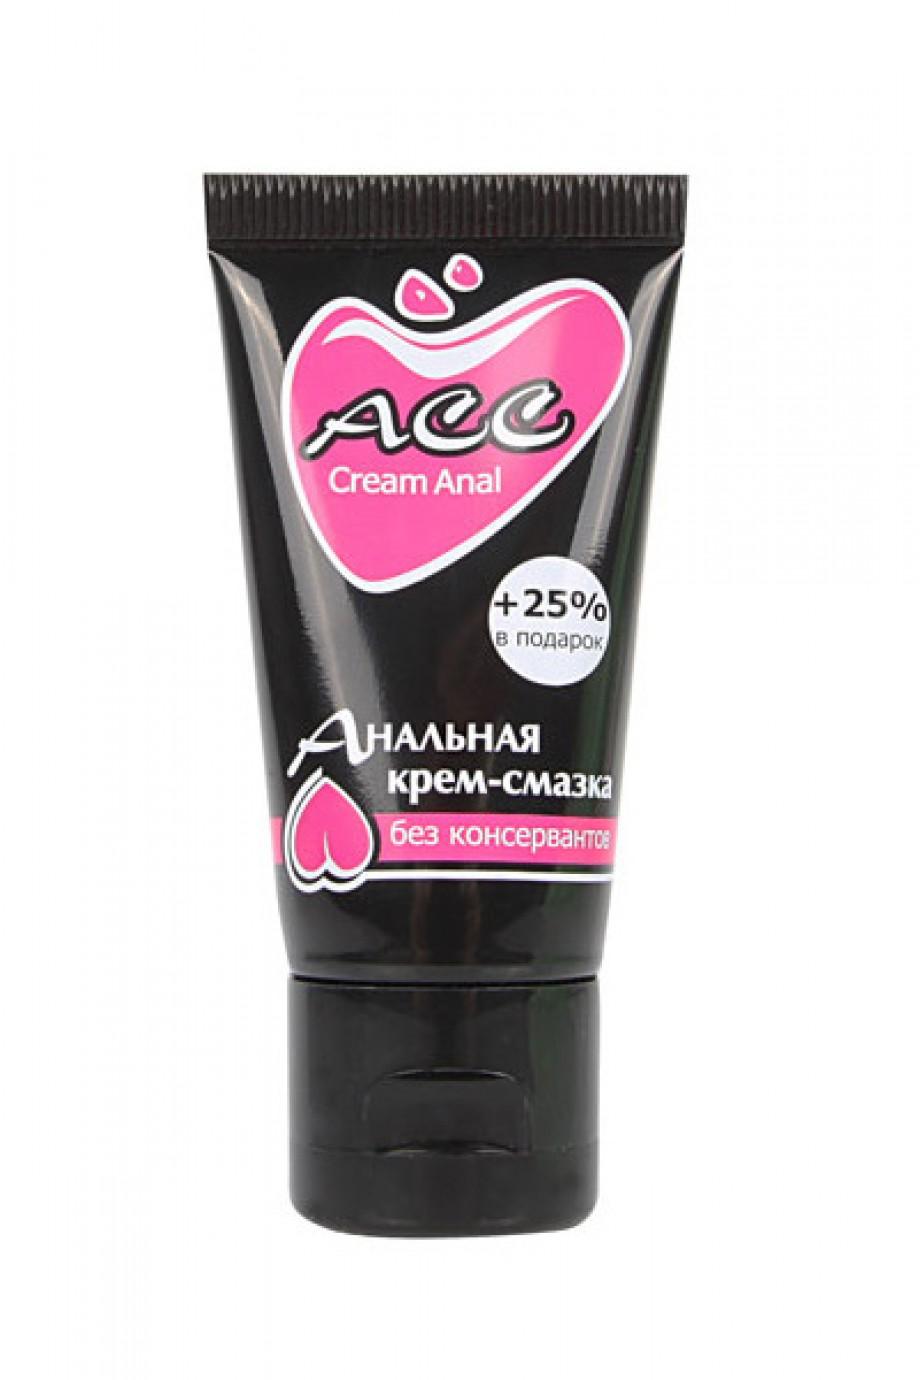 Крем-смазка Creamanal АСС, 25мл